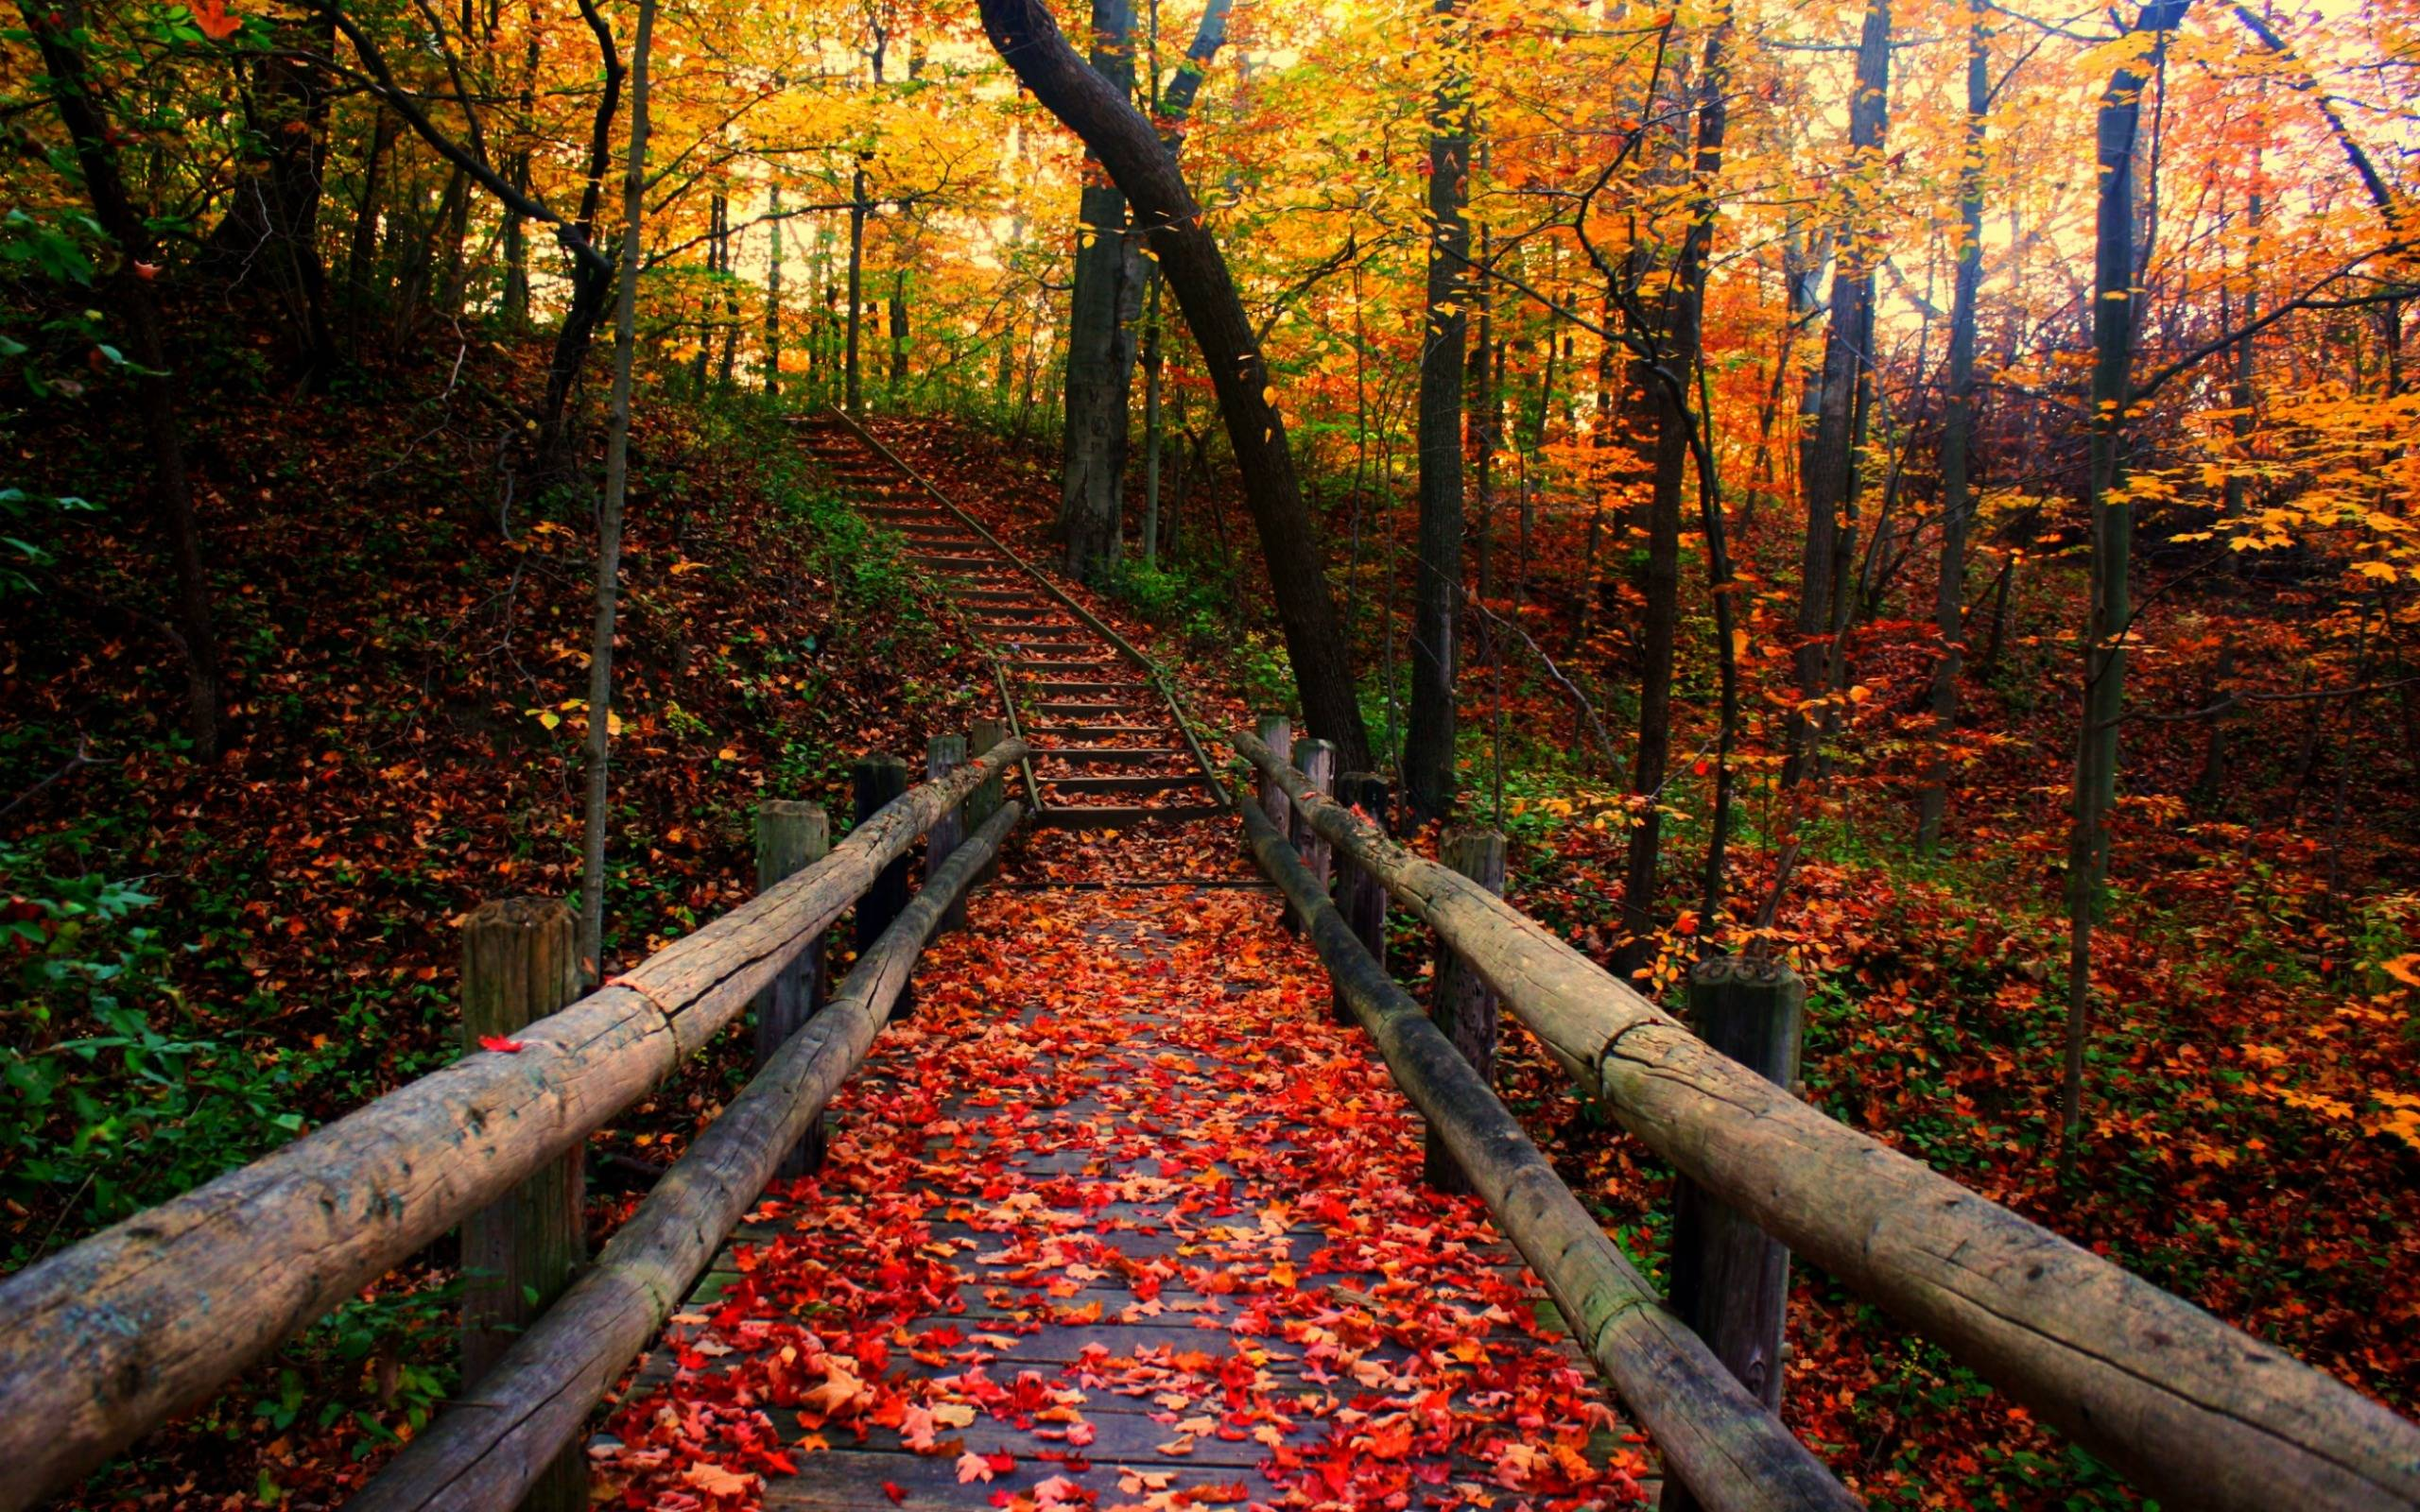 Fall Season Backgrounds - Wallpaper Cave